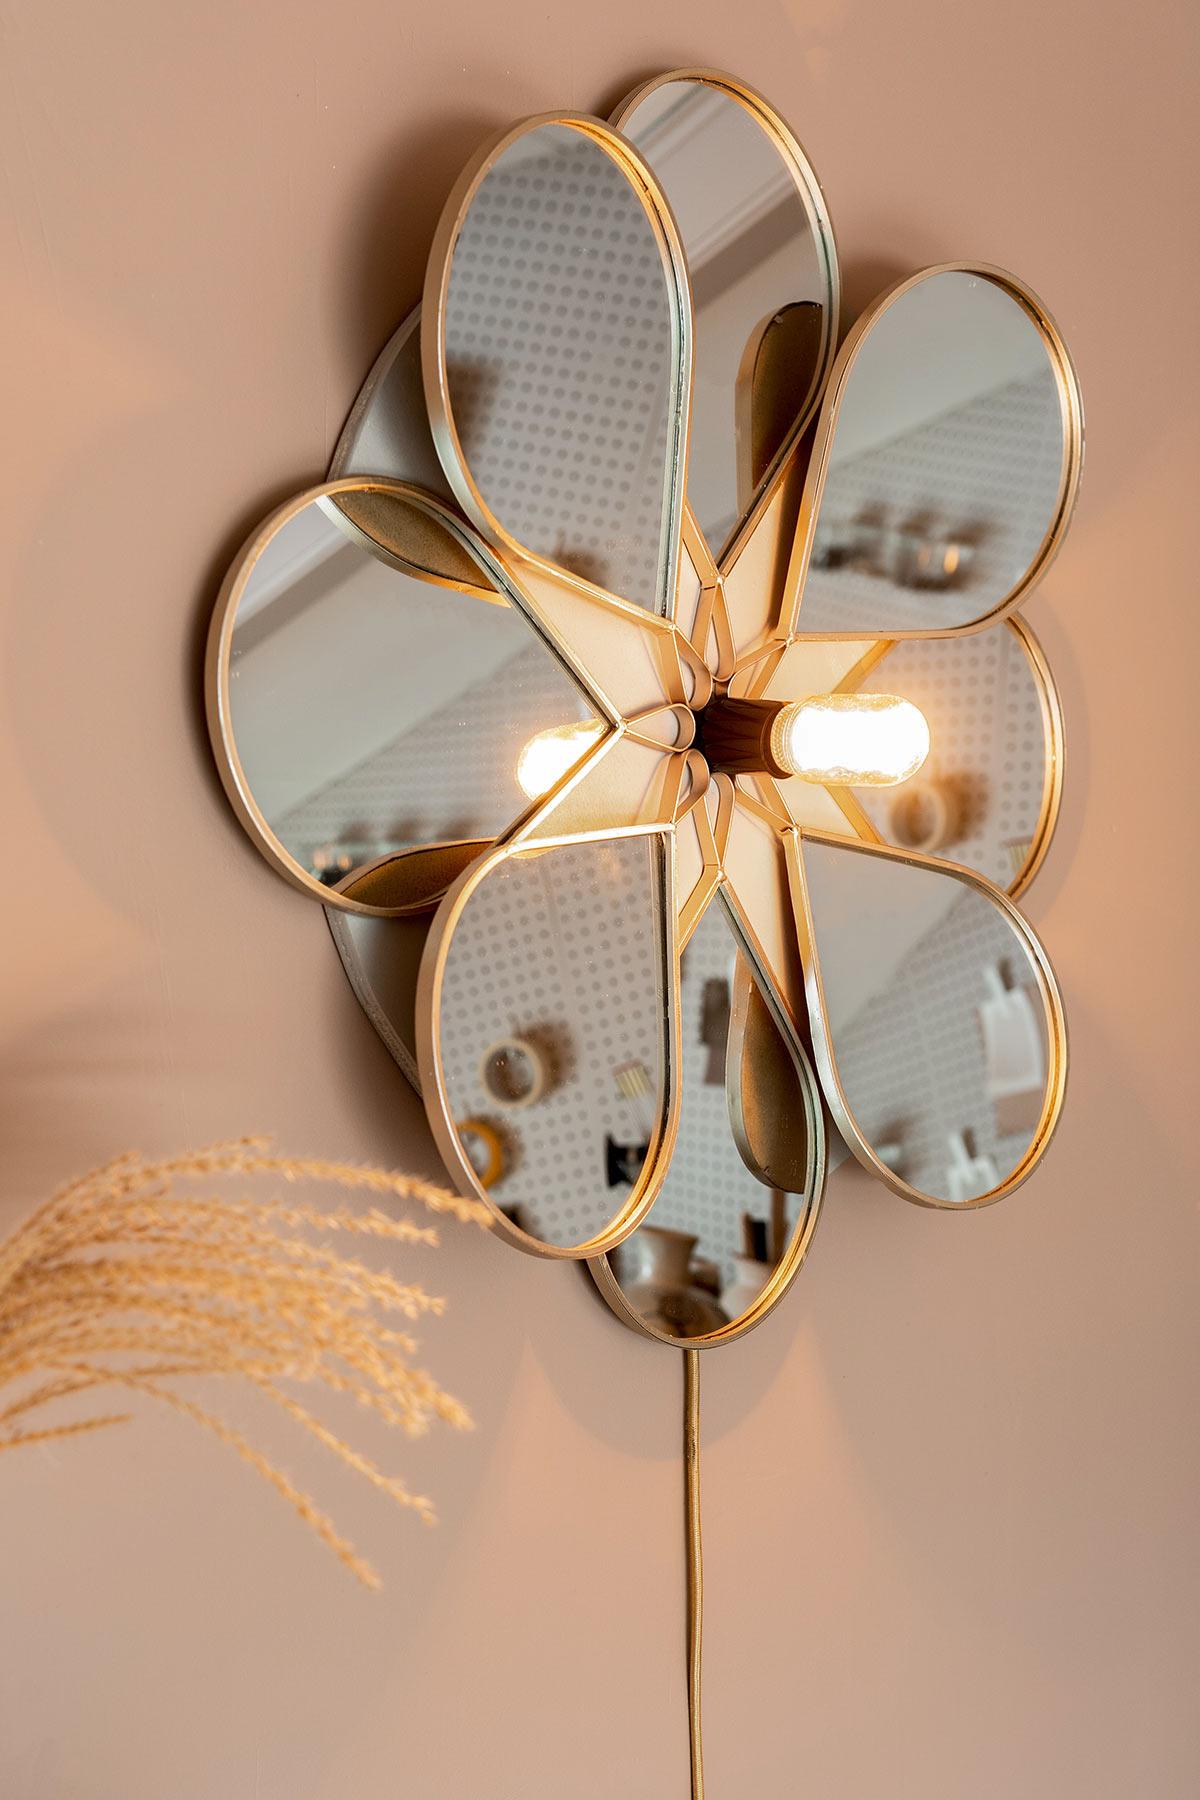 DIY wandlamp bloem spiegel - Tanja van Hoogdalem